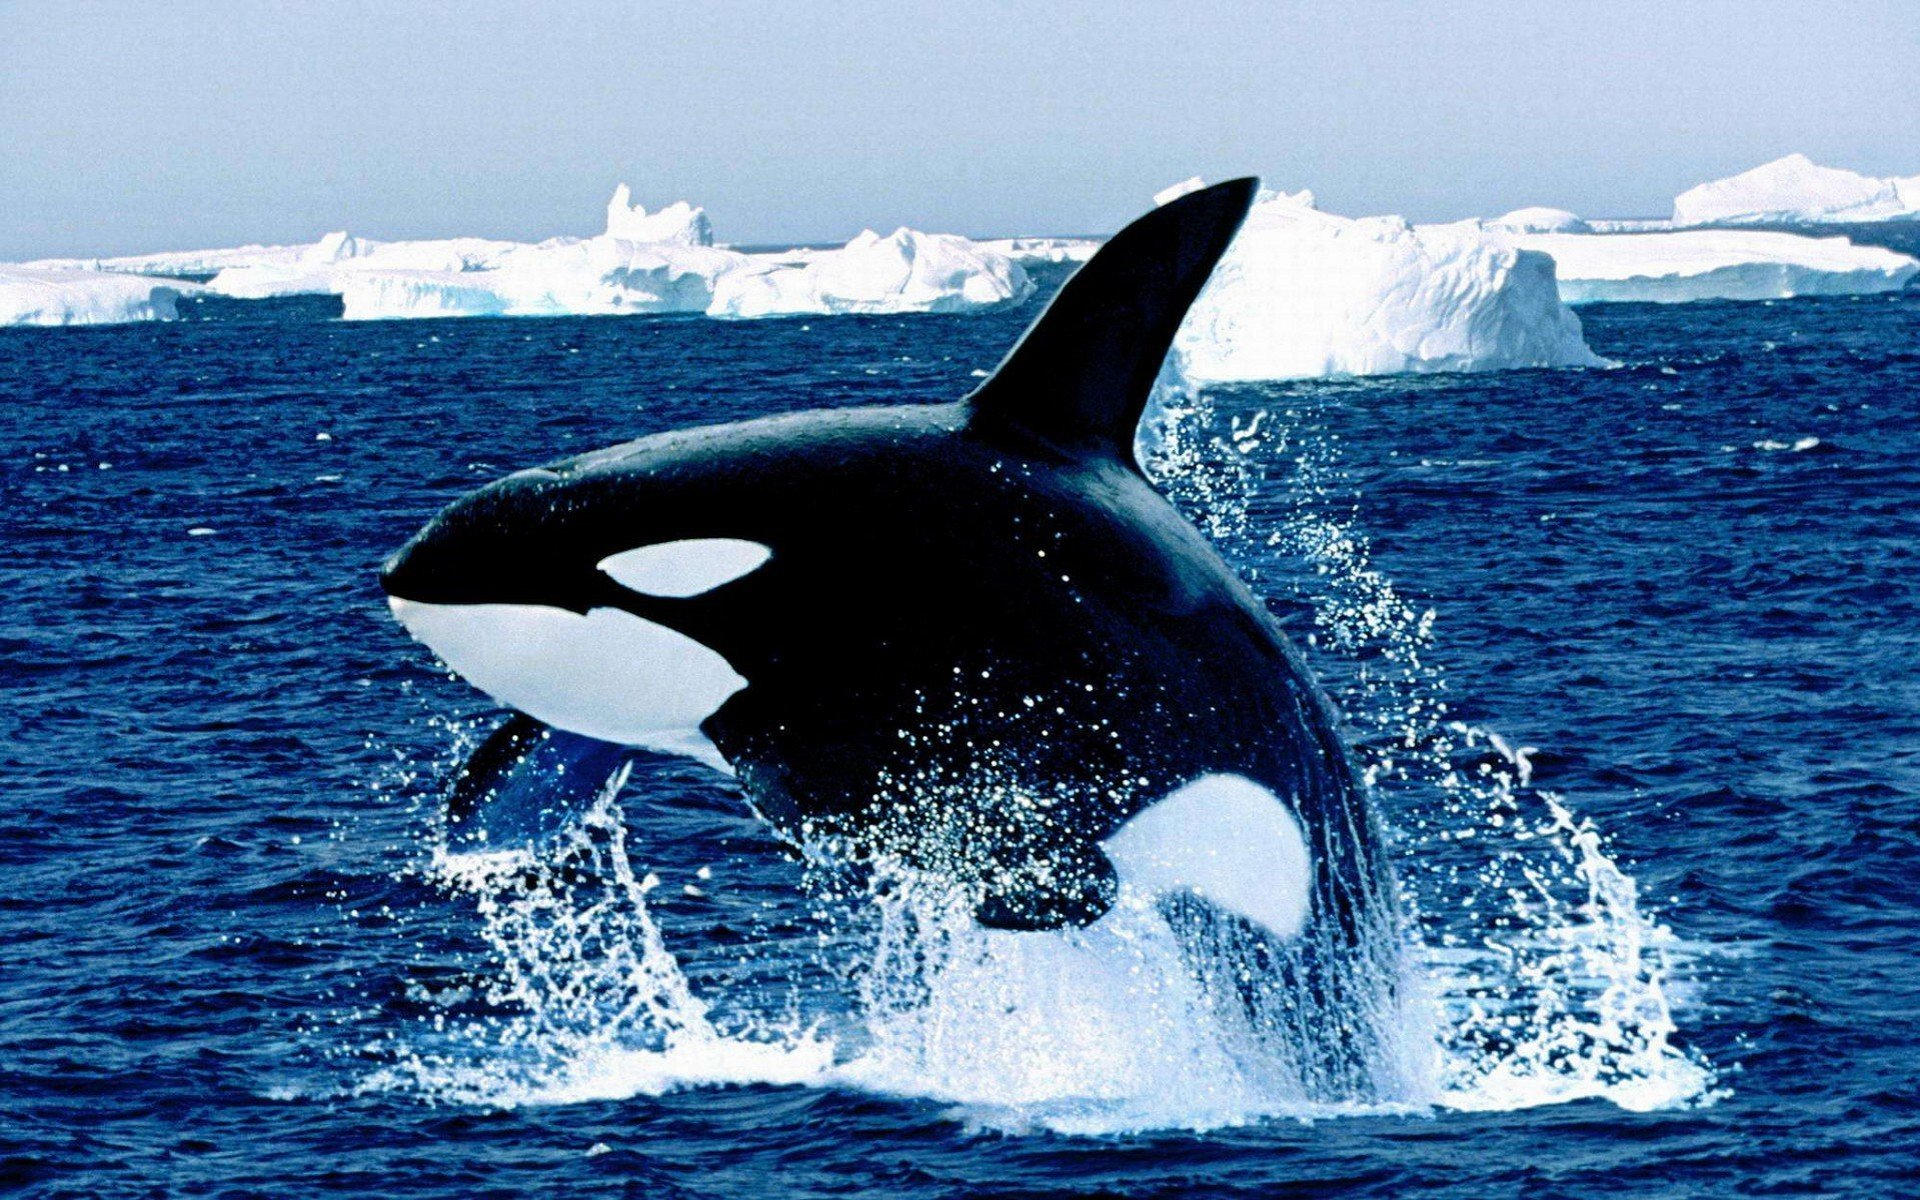 Animal - Whale  Killer Whale Animal Water Iceberg Wallpaper